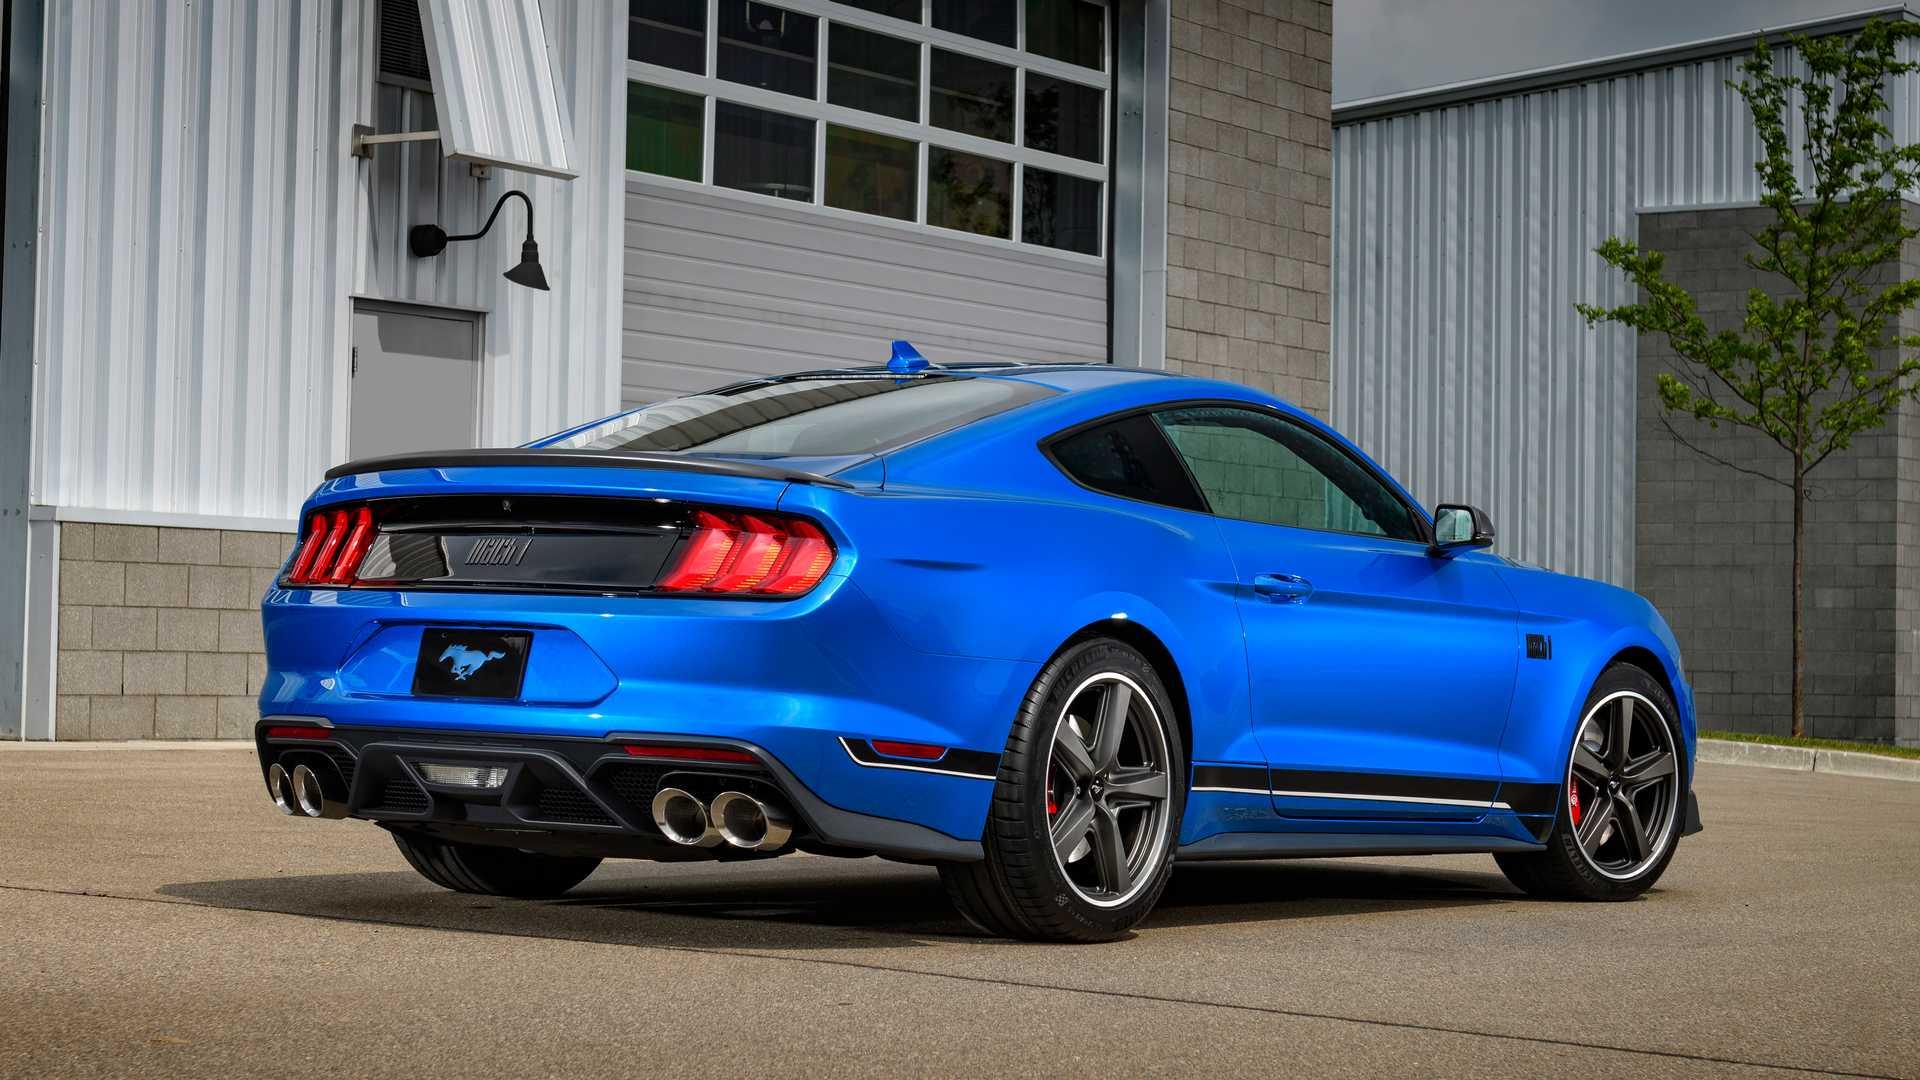 Ford Mustang: Το μέλλον της είναι εγγυημένο